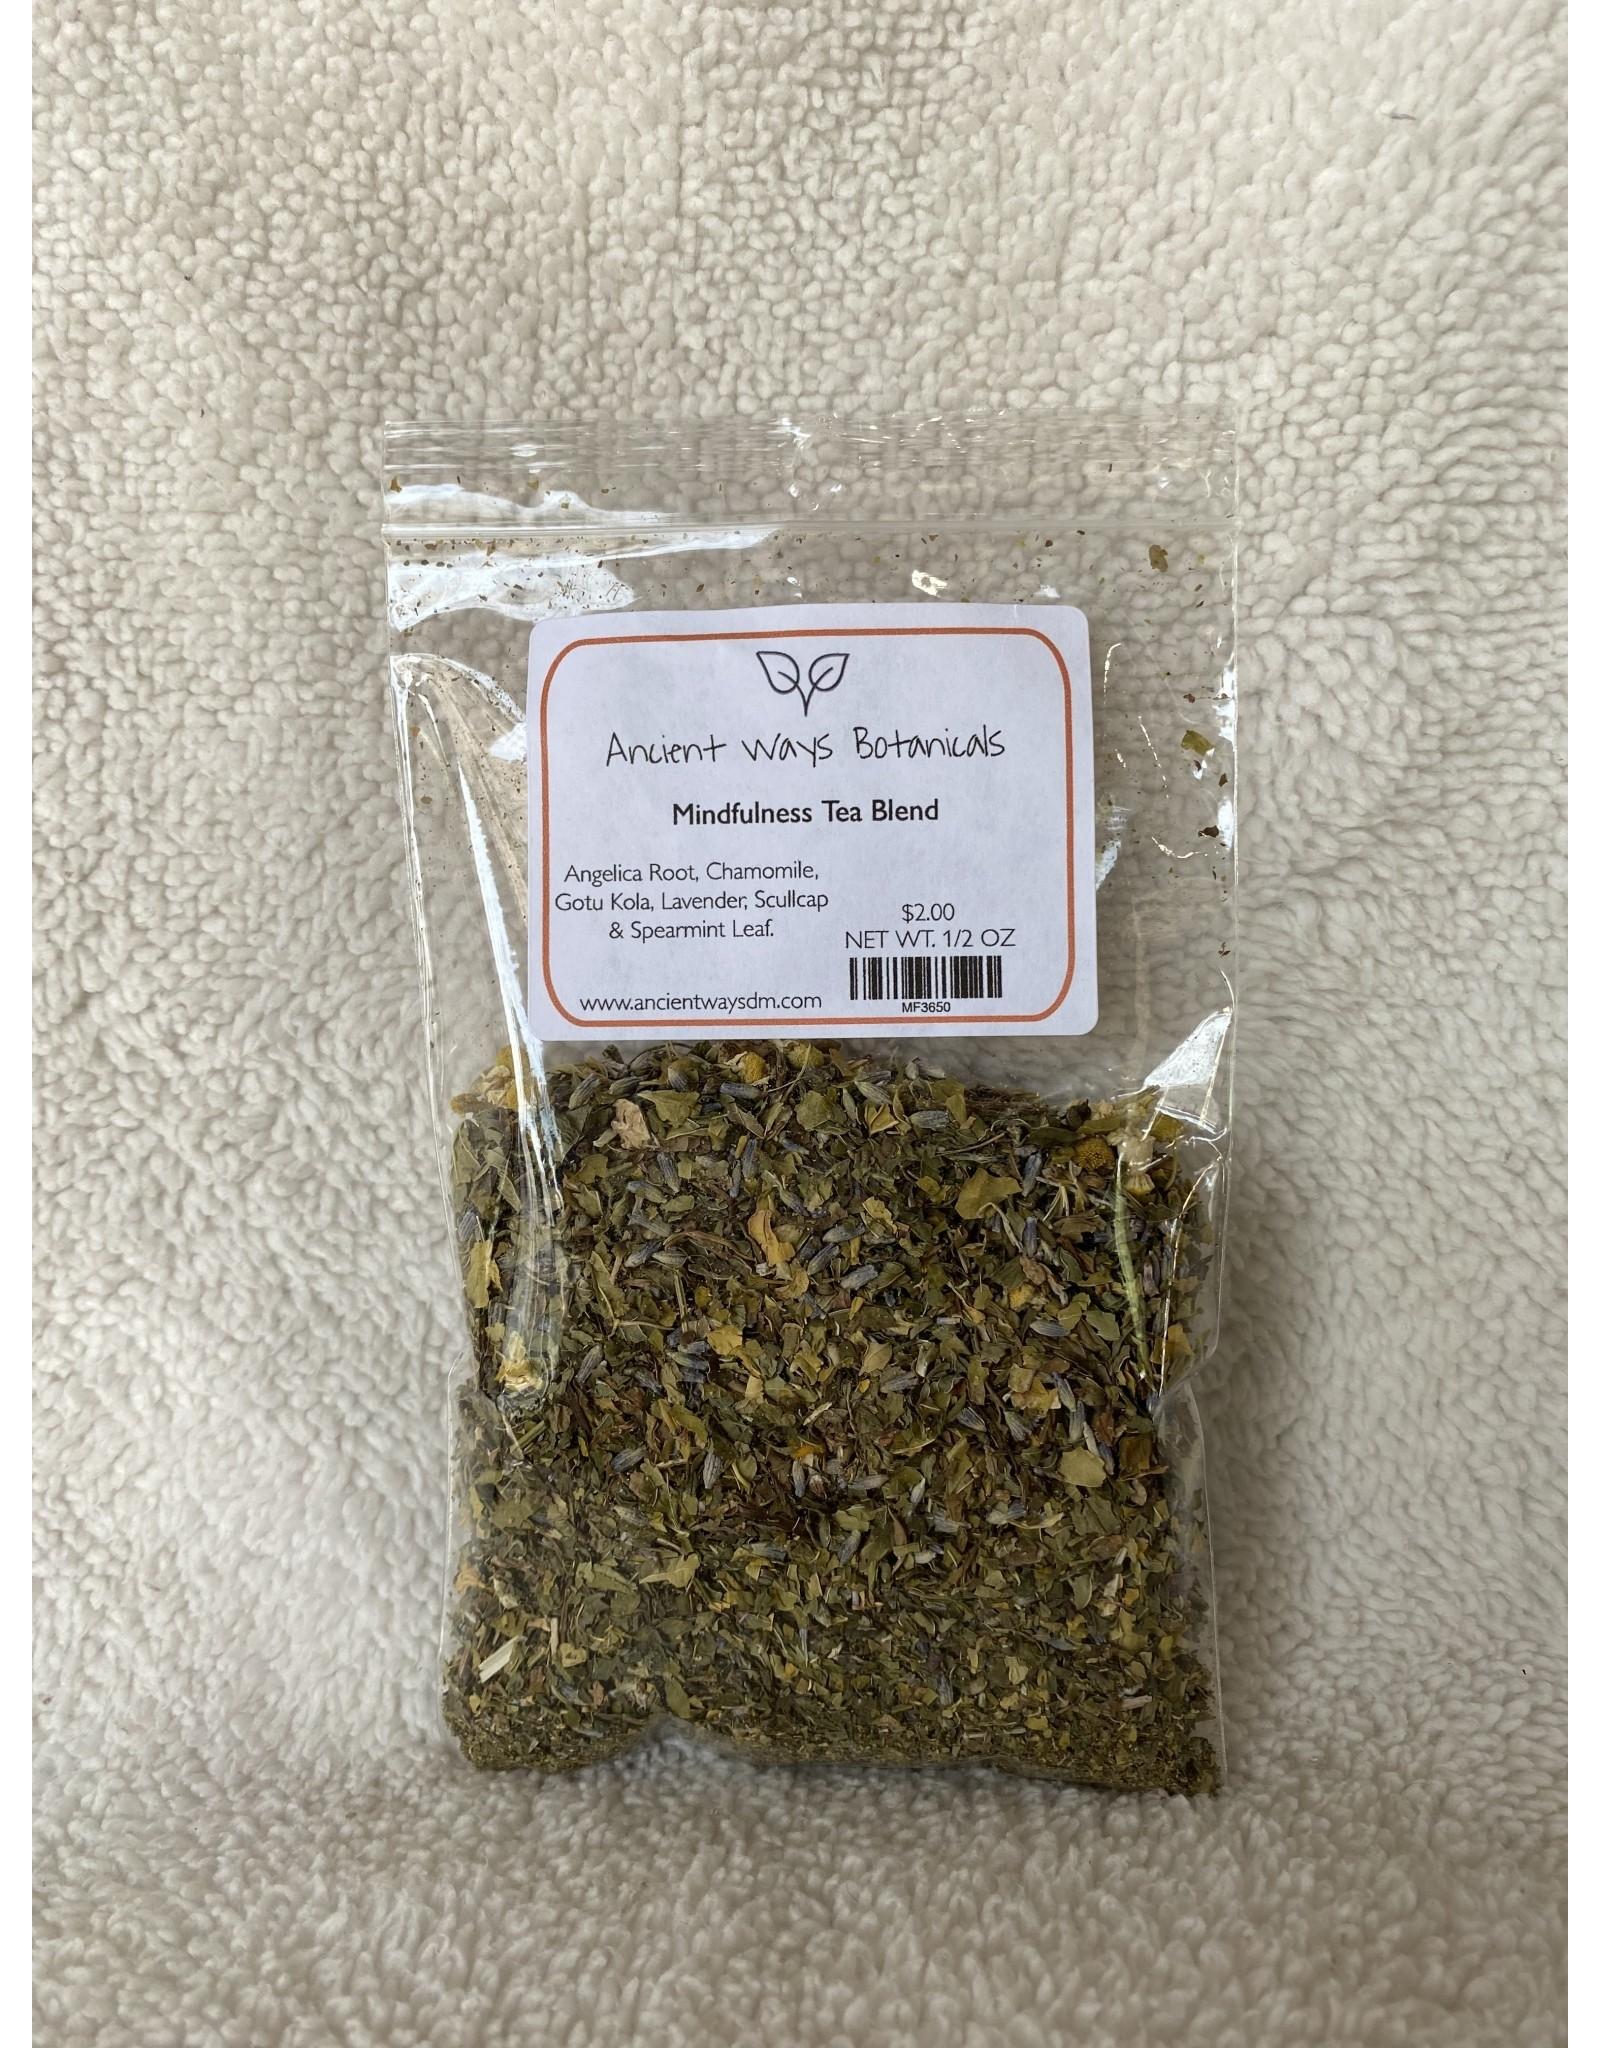 Mindfulness Tea Blend - 1/2 oz.